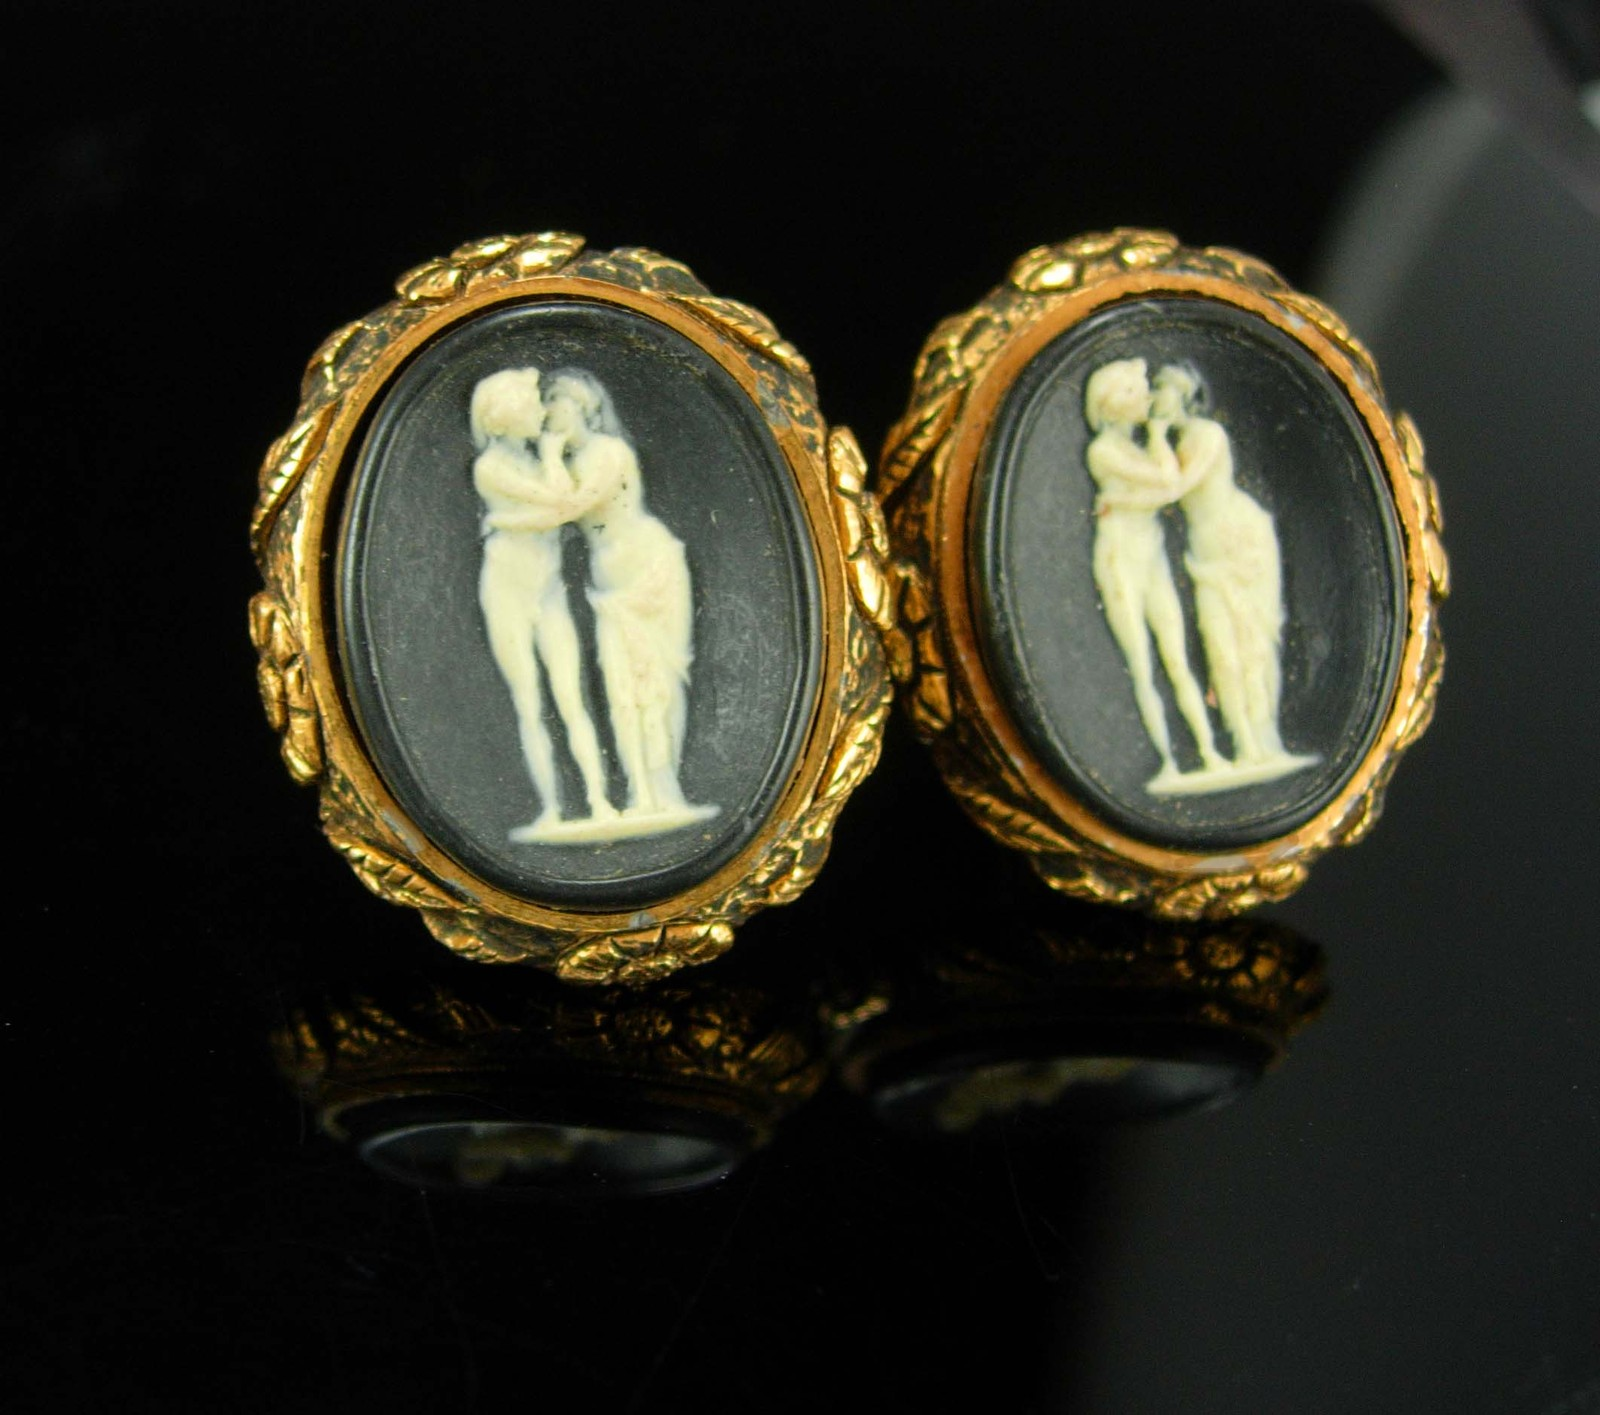 The KISS Cufflinks Nude Goddesses Vintage 3 Graces Greek Mythology Mens gold Inc